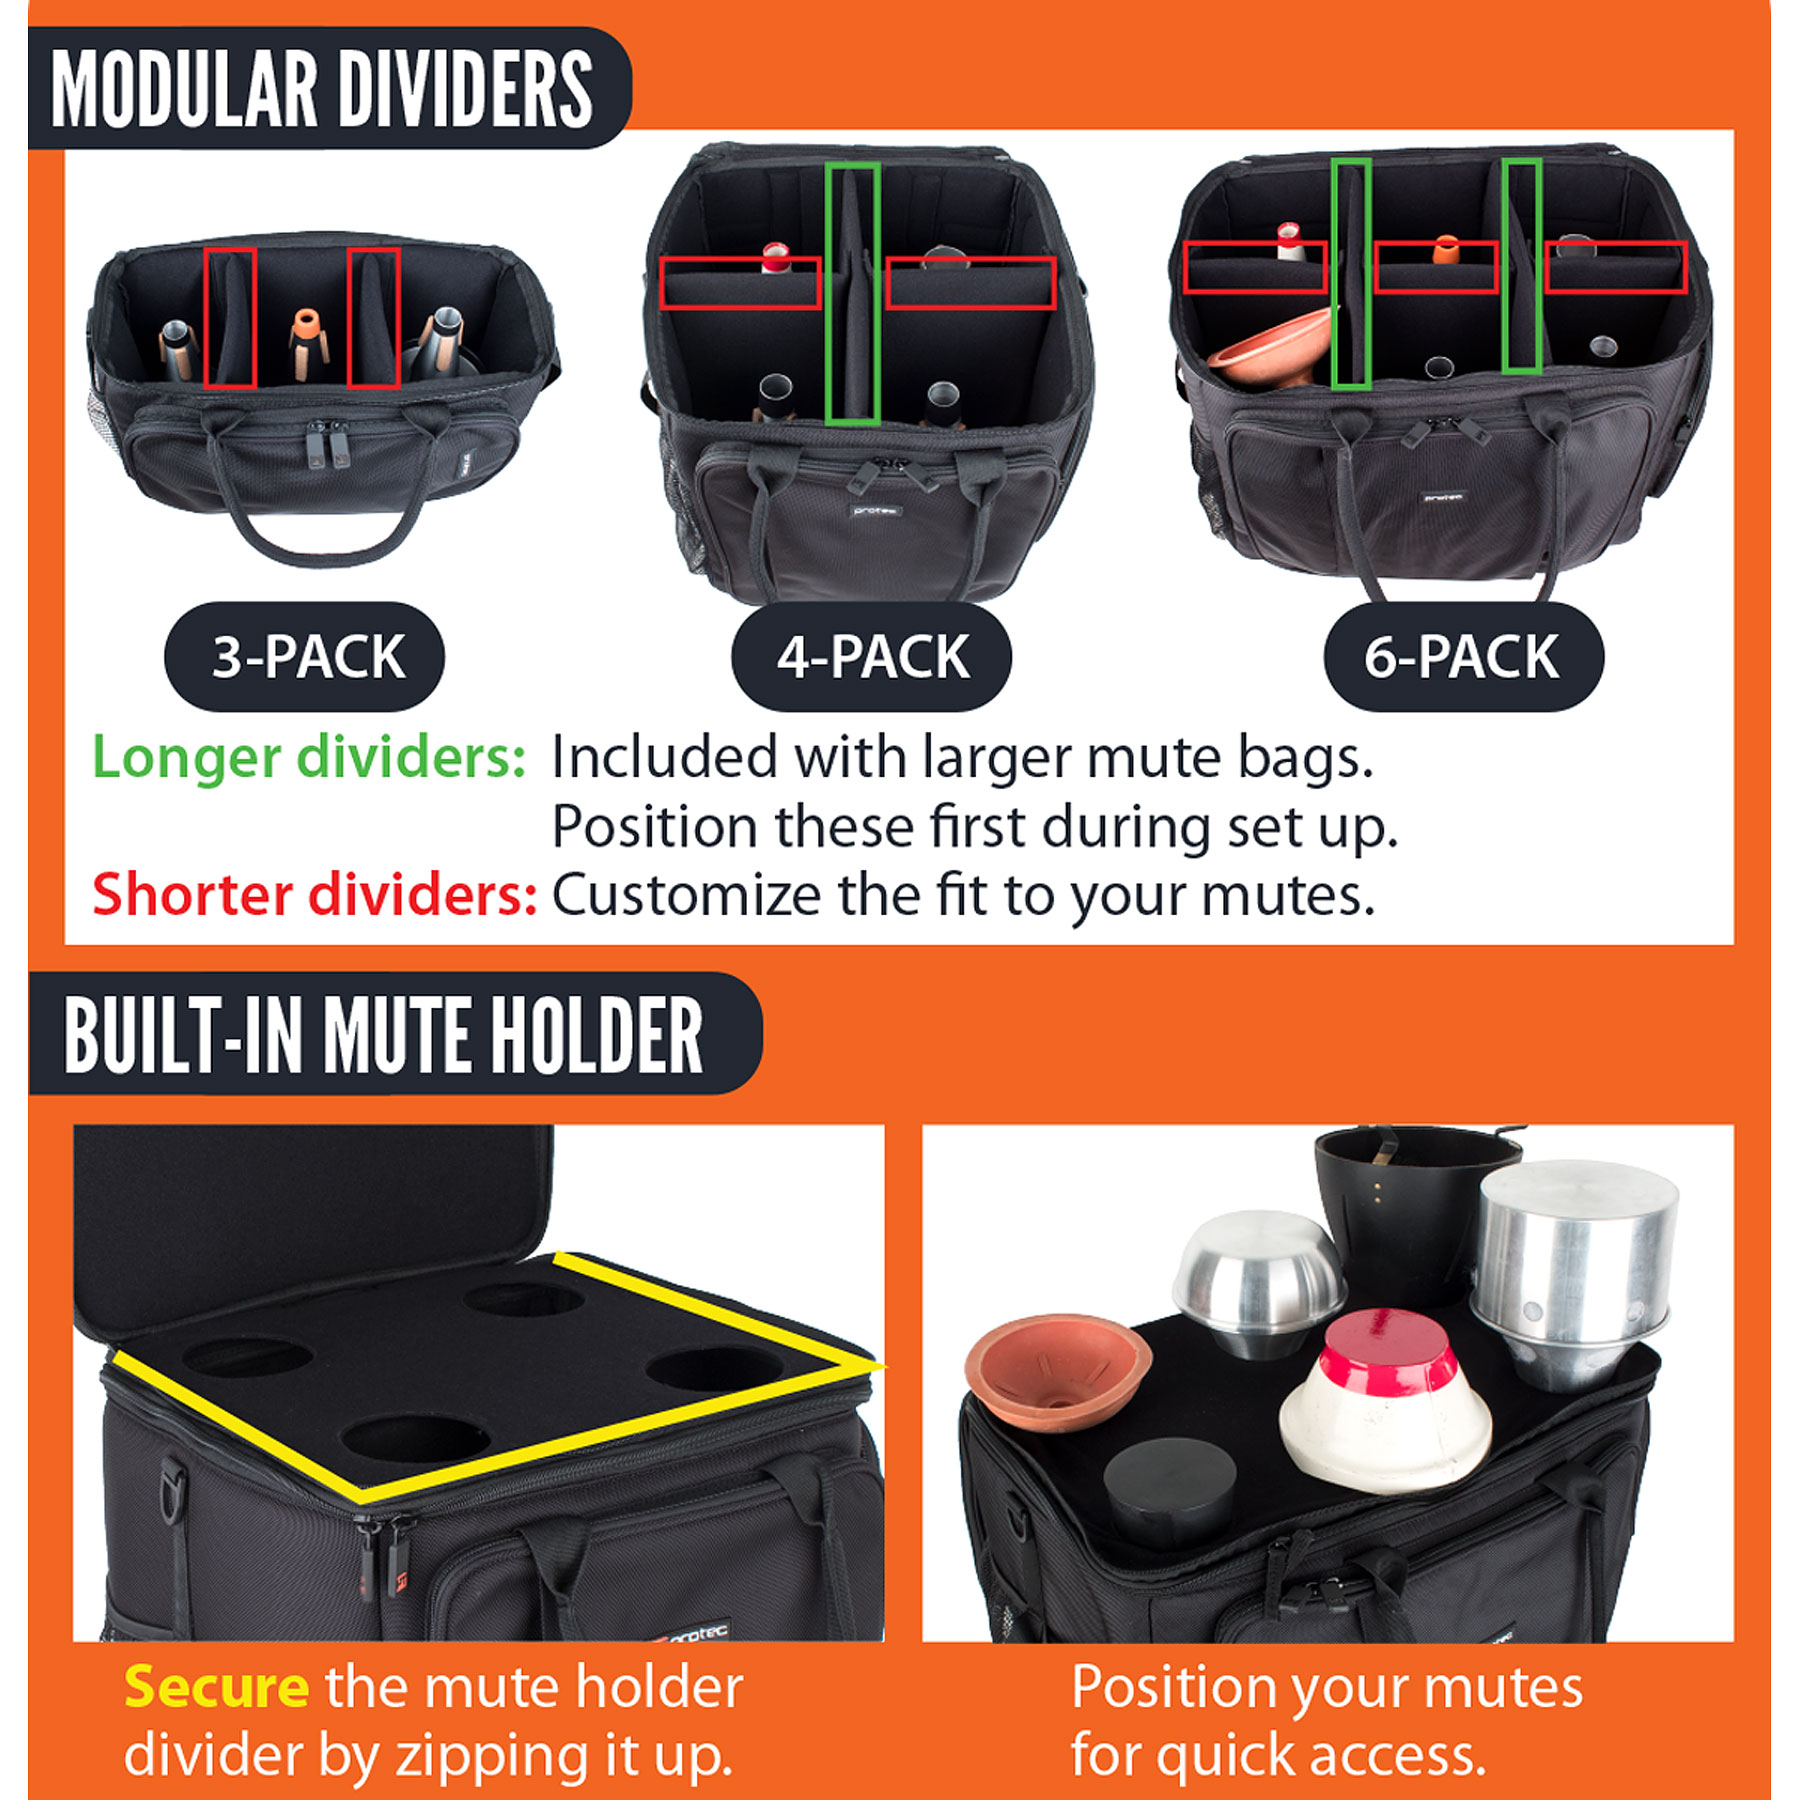 mute-bag-instructions.jpg